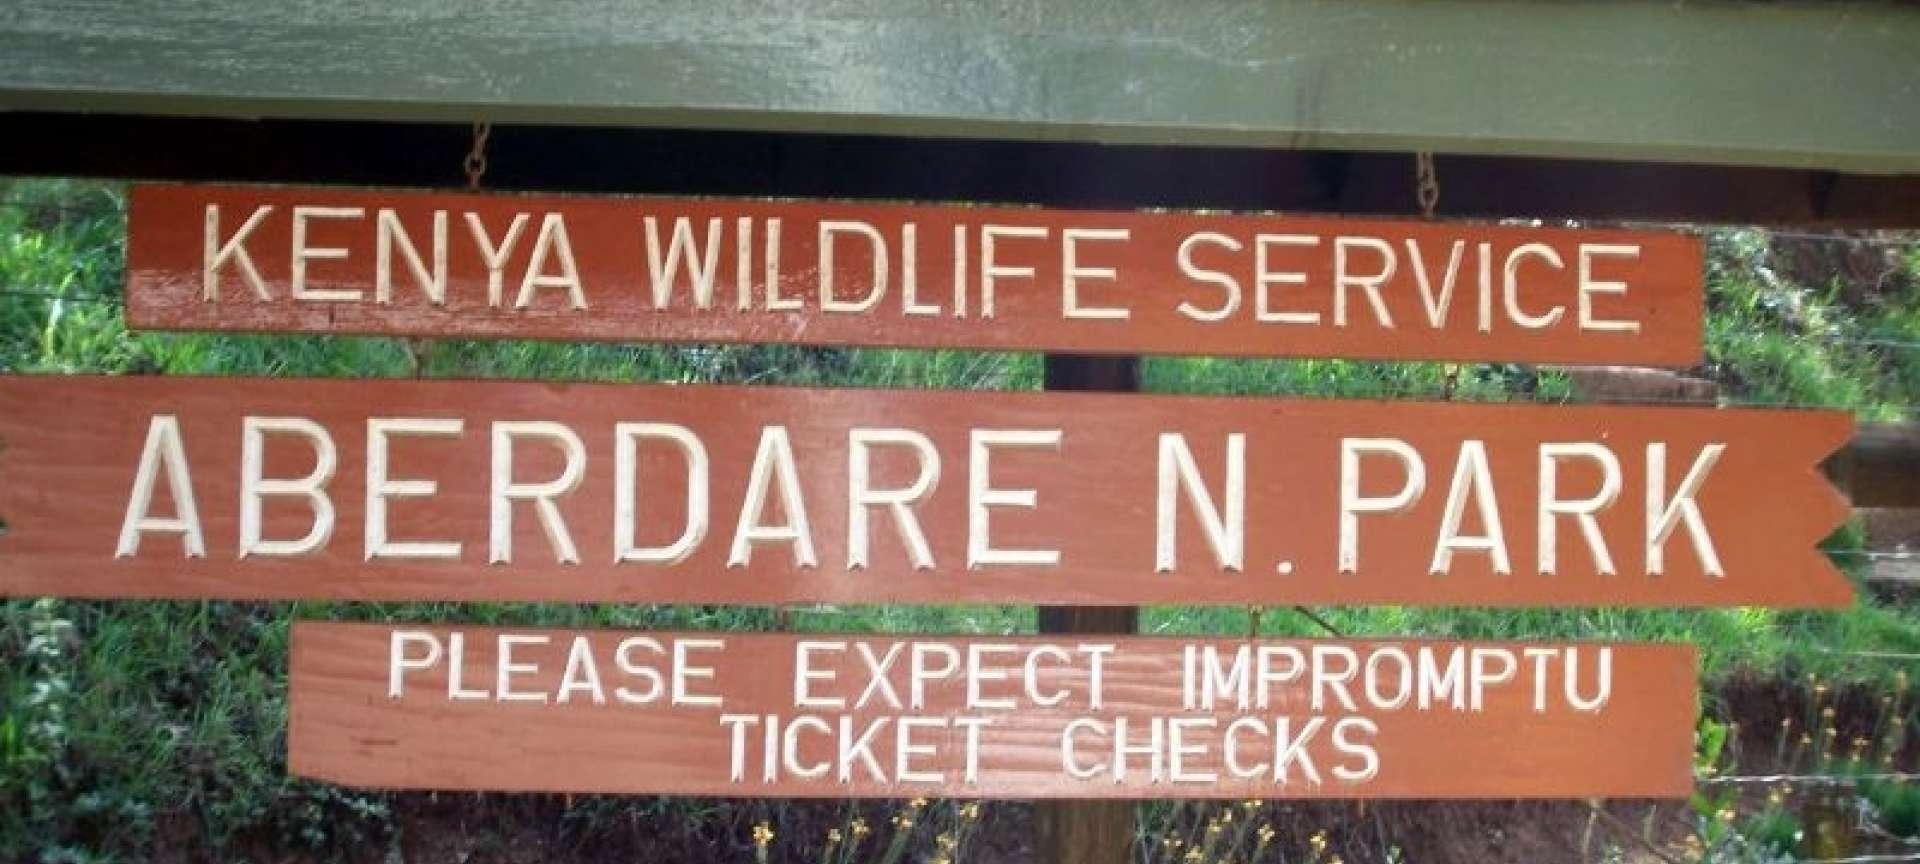 Aberdare National Park - Africa Wildlife Safaris